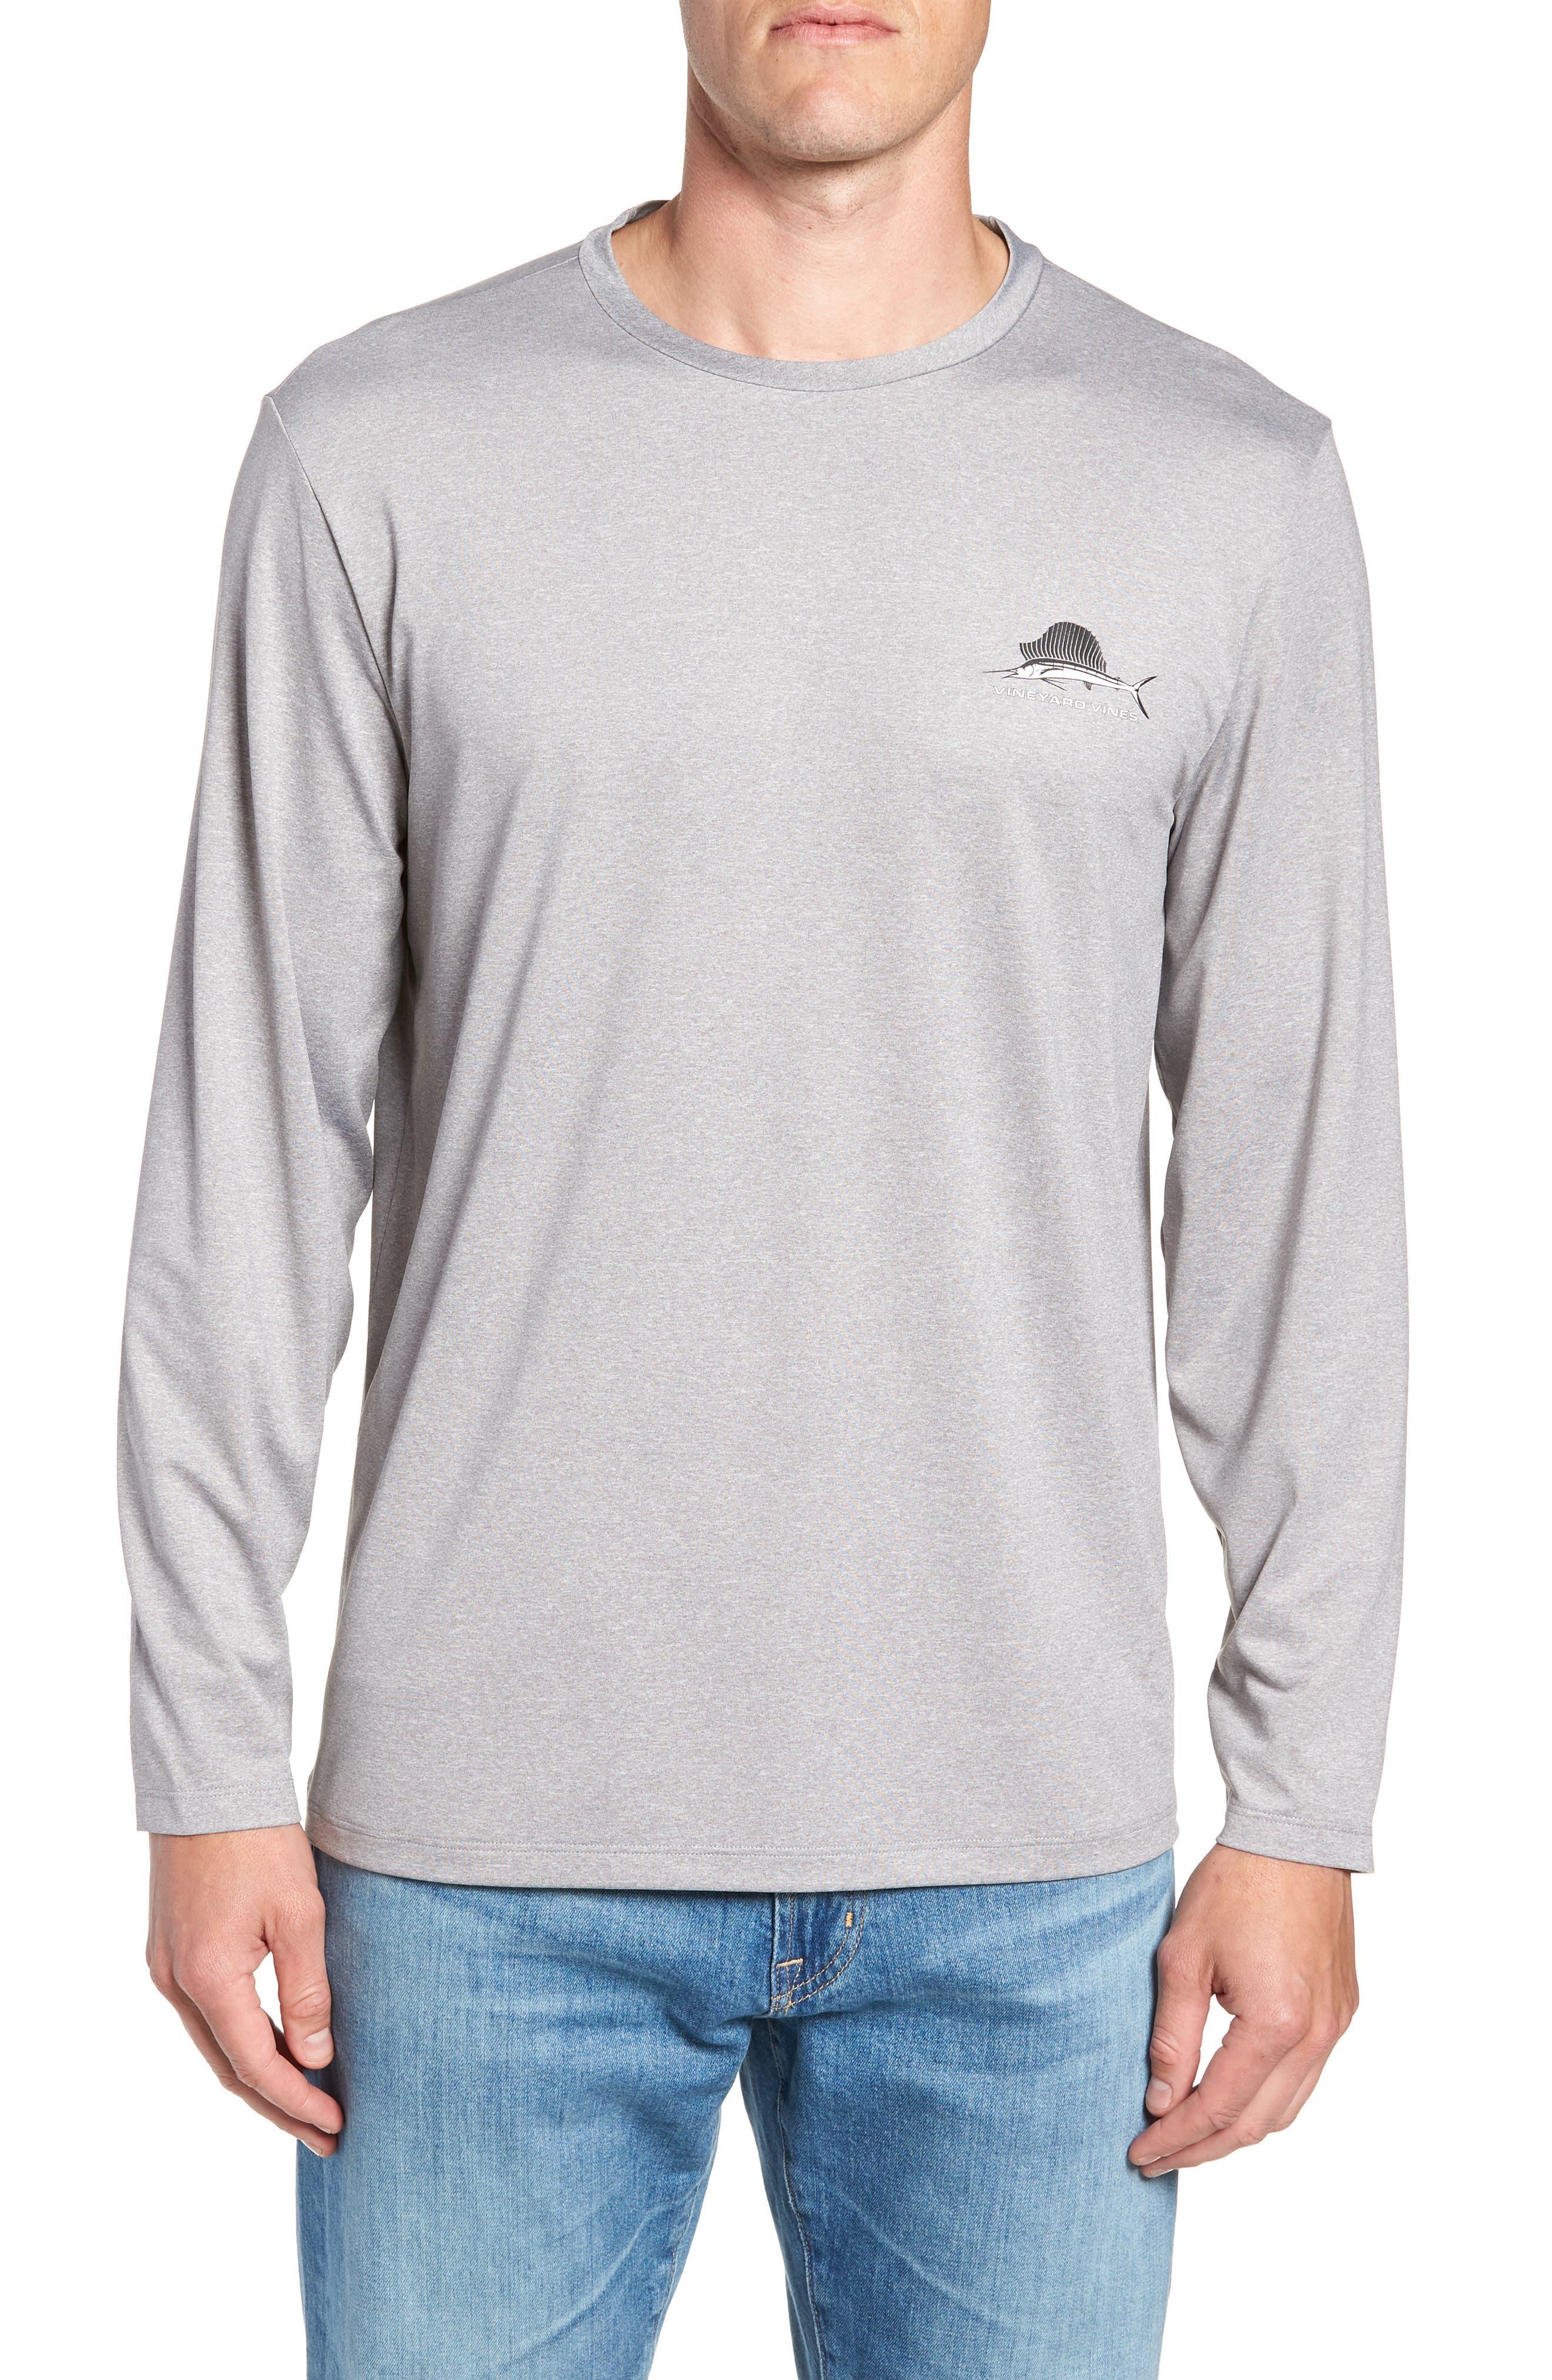 Sailfish Logo Performance T-Shirt,                             Main thumbnail 1, color,                             039